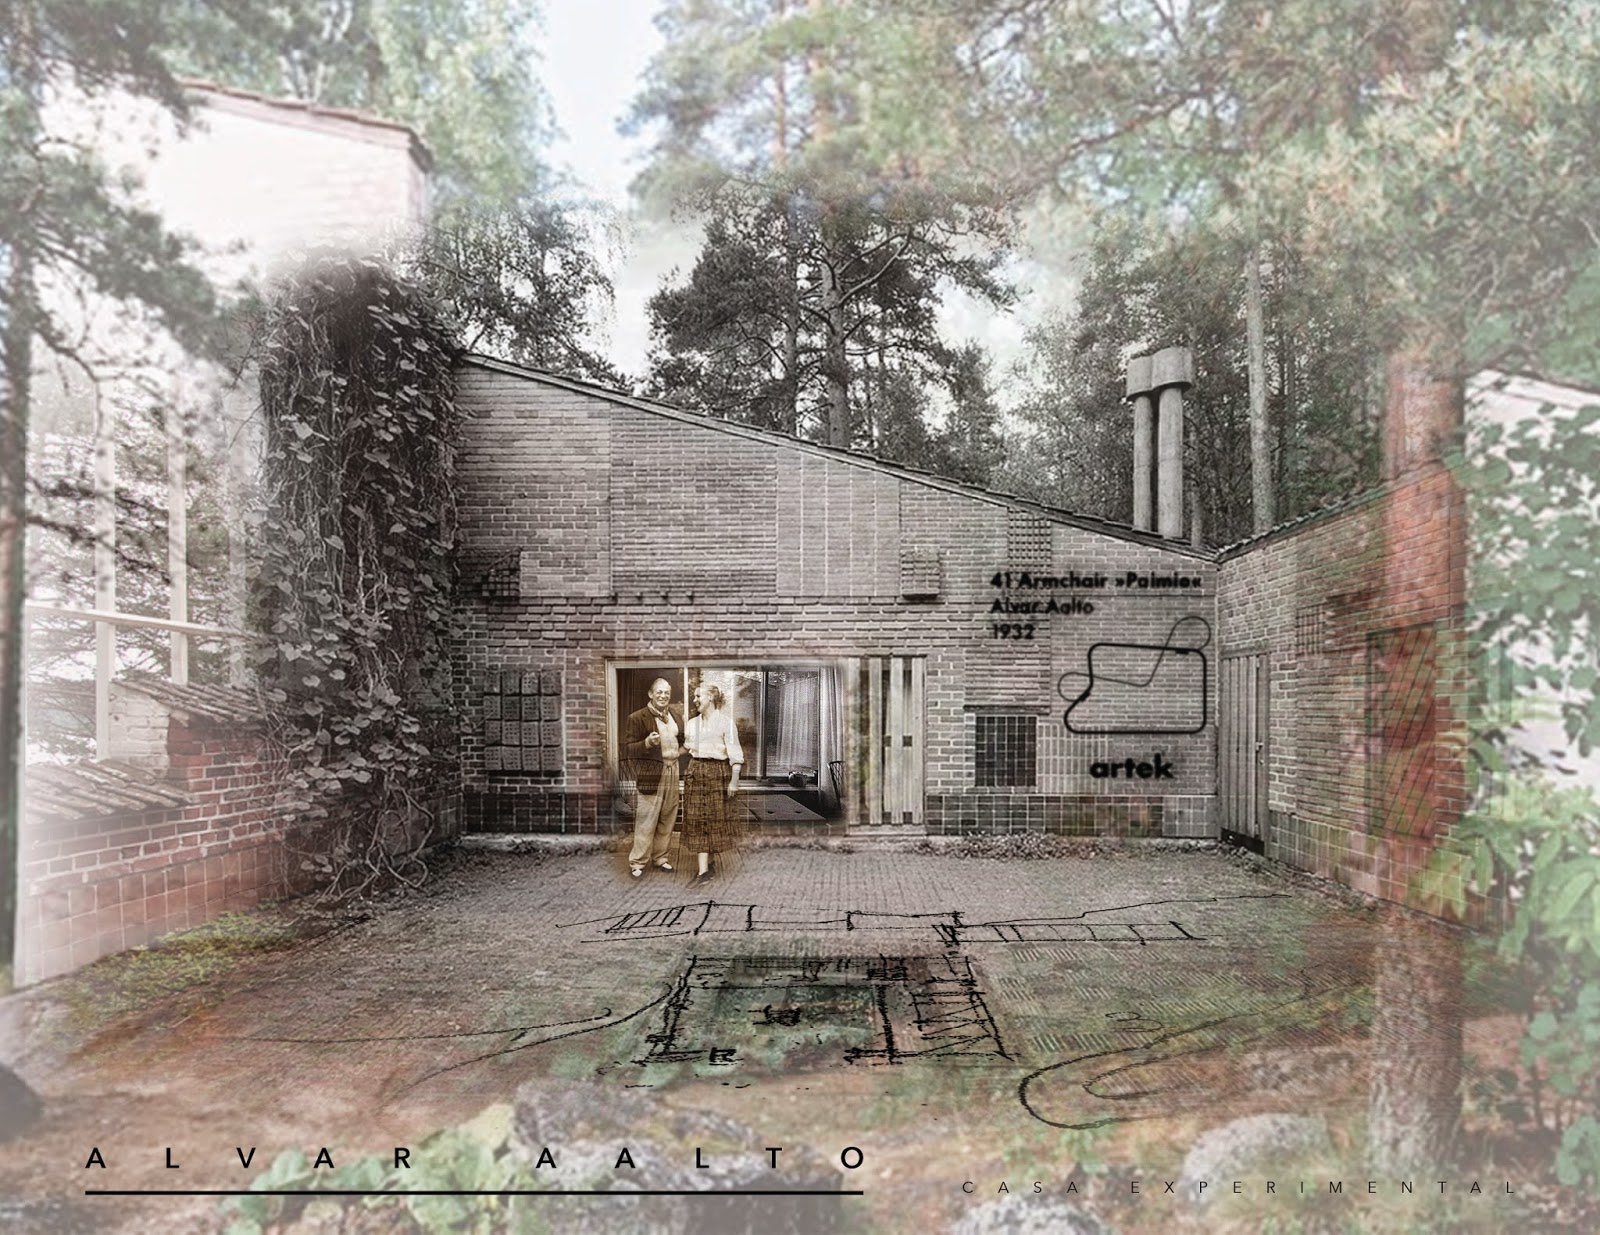 Historia de la arquitectura moderna casa aalto muuratsalo for Historia de la arquitectura moderna